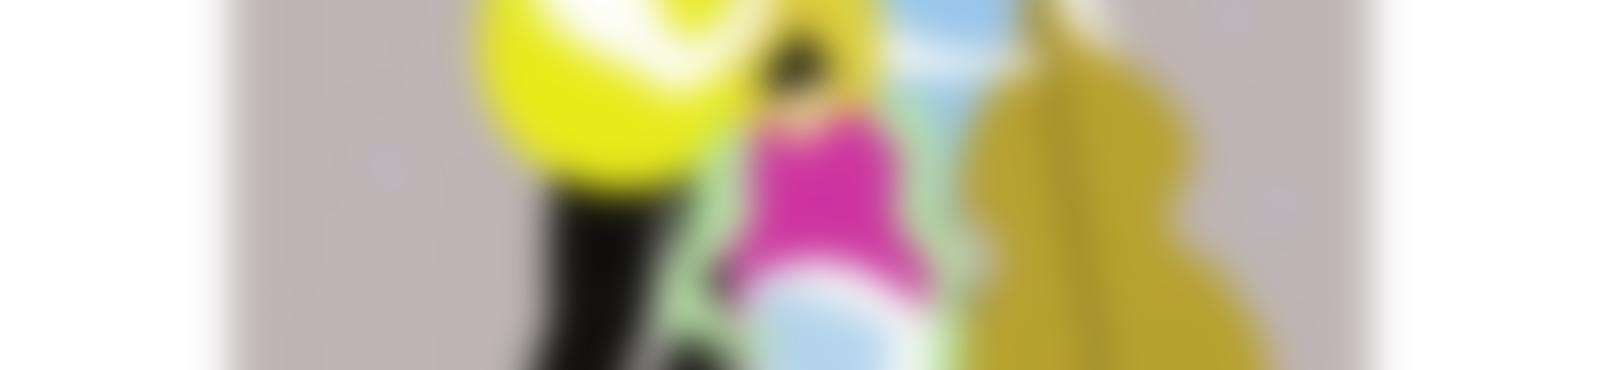 Blurred fa21b05e 9e80 408f 8f3f 4367eb654076